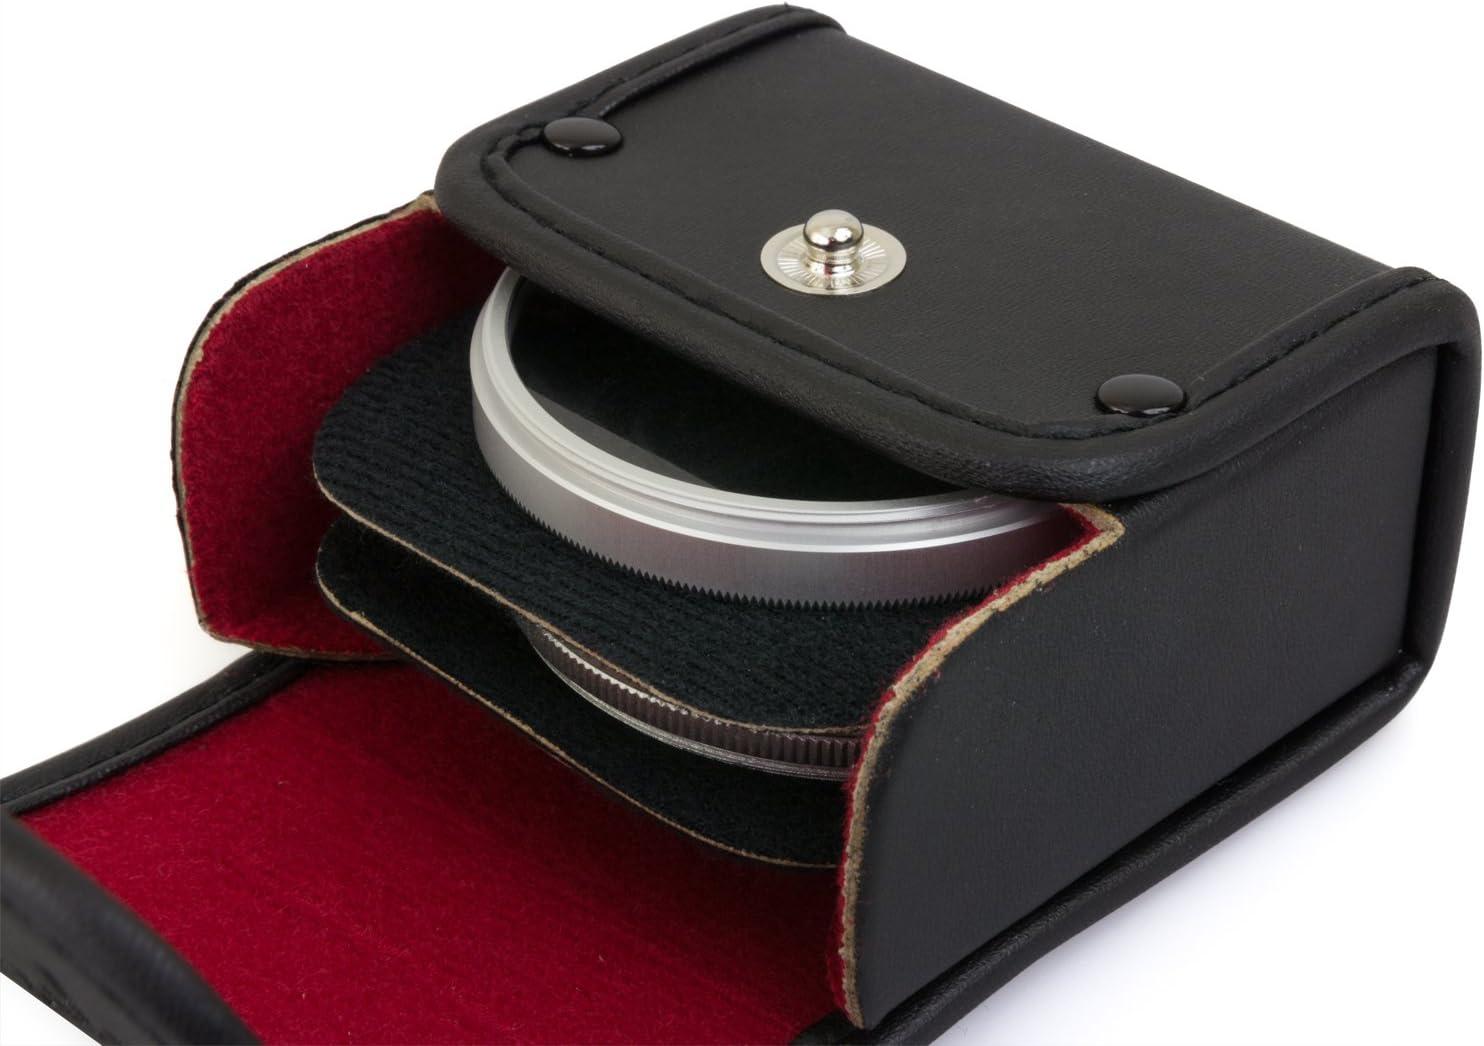 UV, PL, FL Filter Kit for Panasonic Lumix DMC-FZ100 Digital Camera Opteka HD2 3 Piece